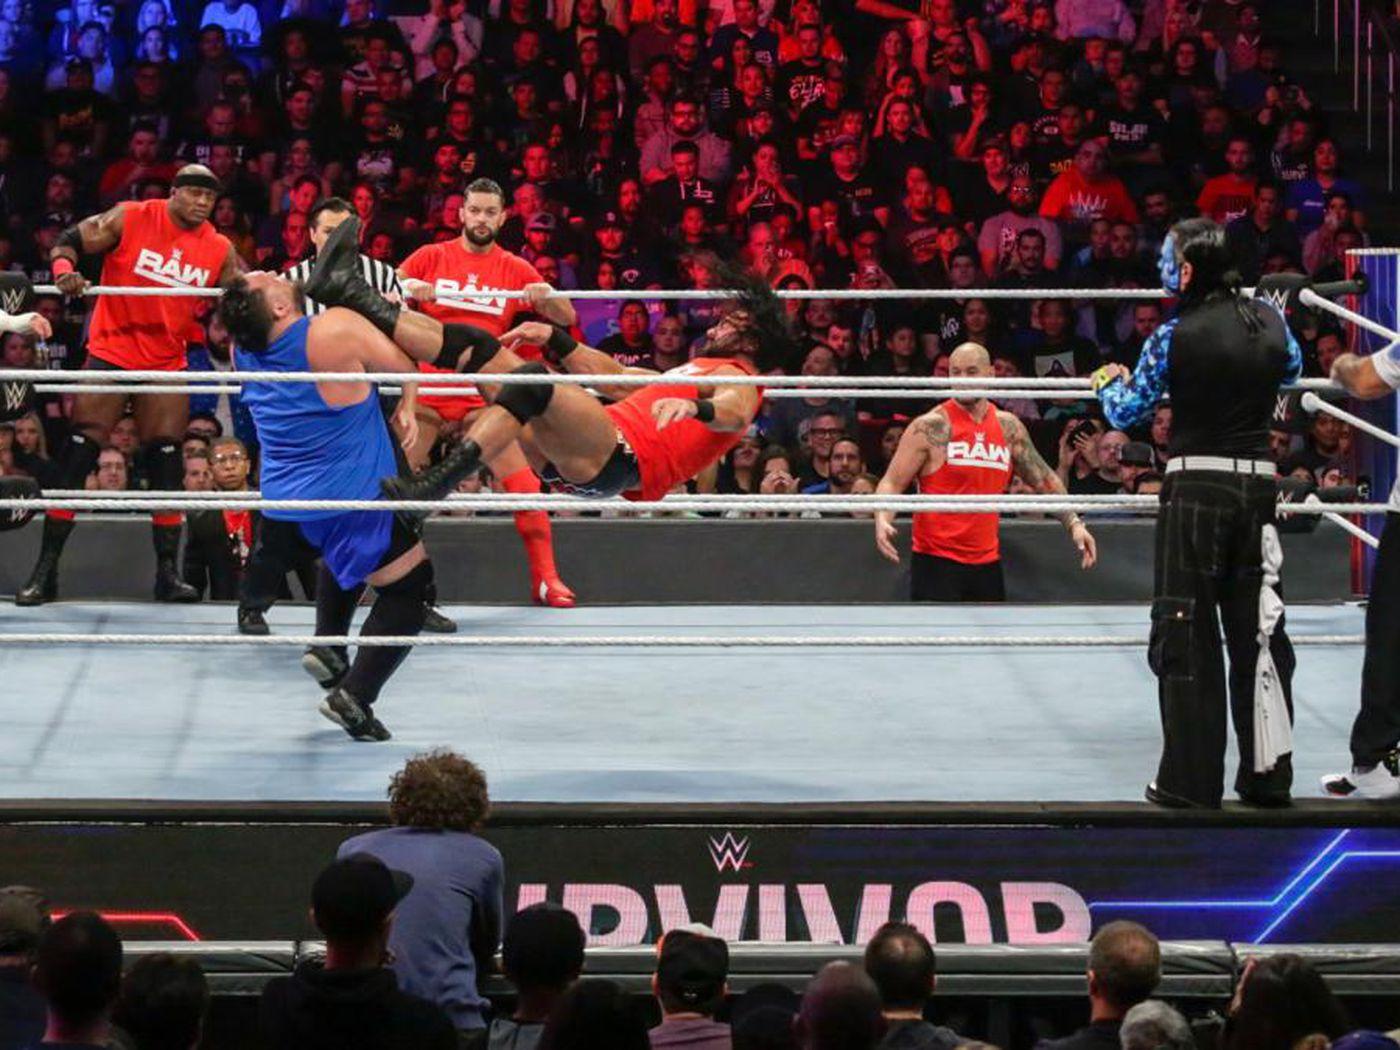 WWE Survivor Series 2018 match times stats breakdown - Cageside Seats